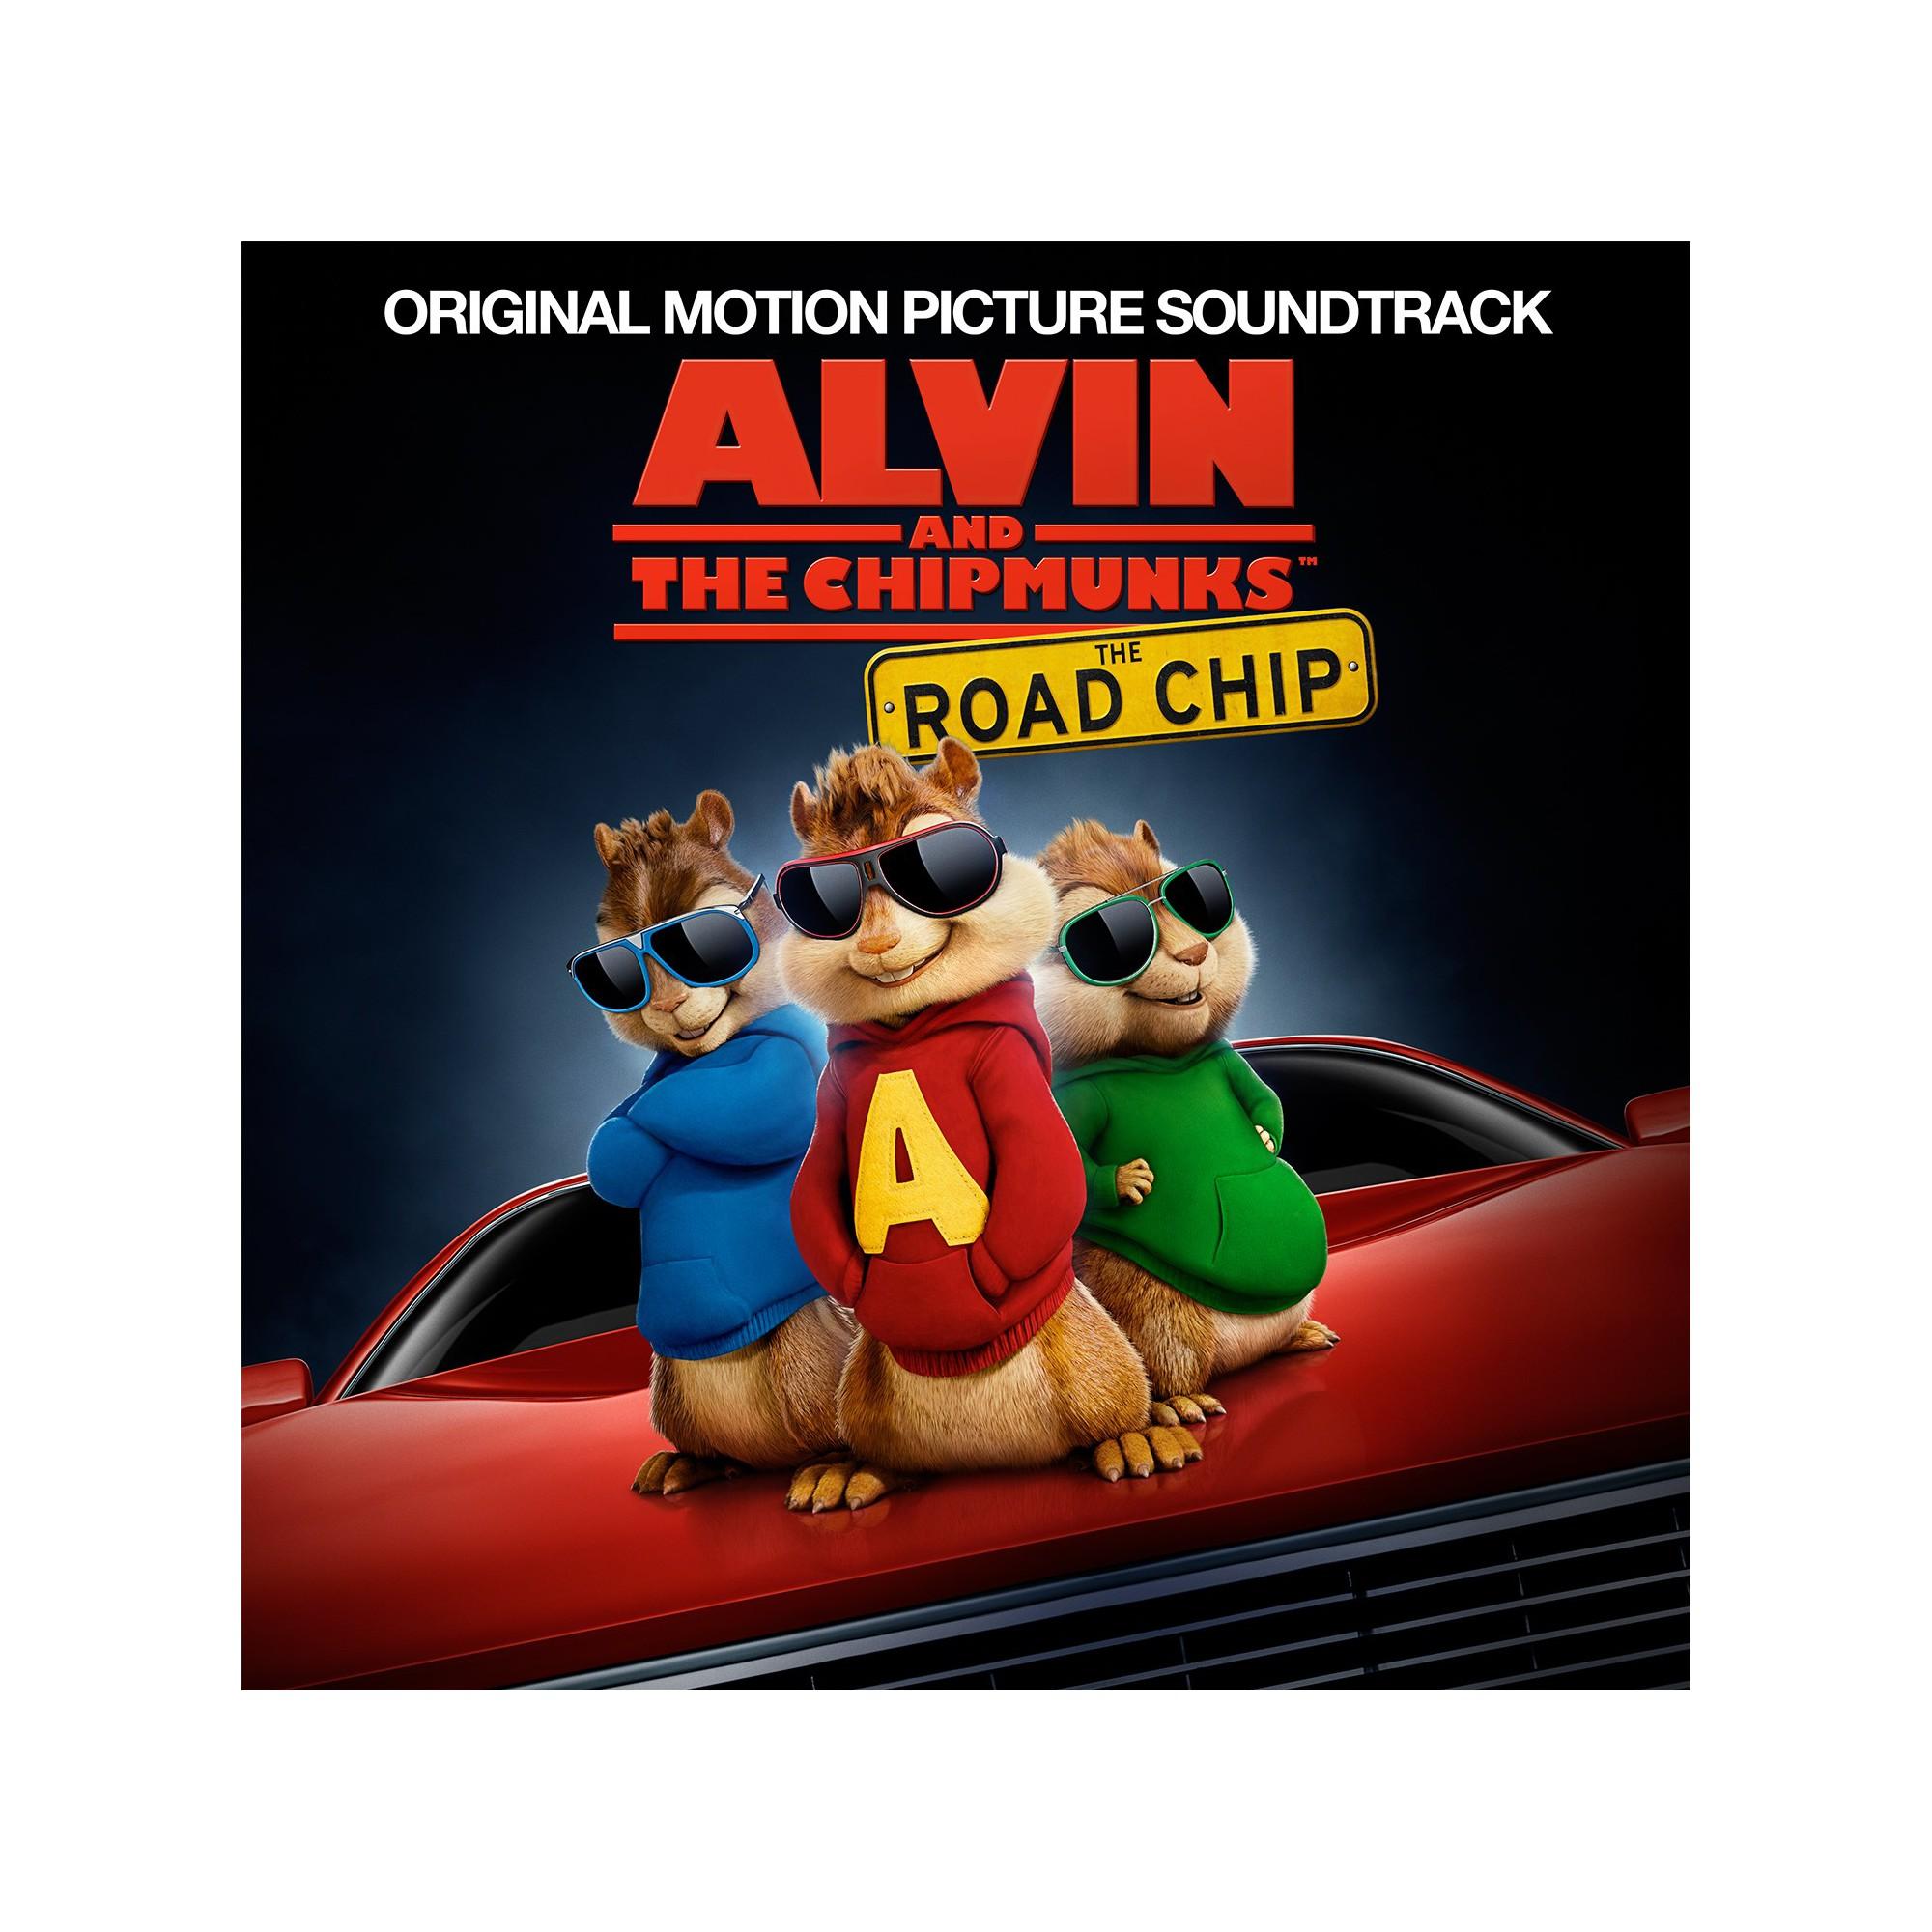 Alvin & The Chipmunks Road Chip Alvin, the chipmunks